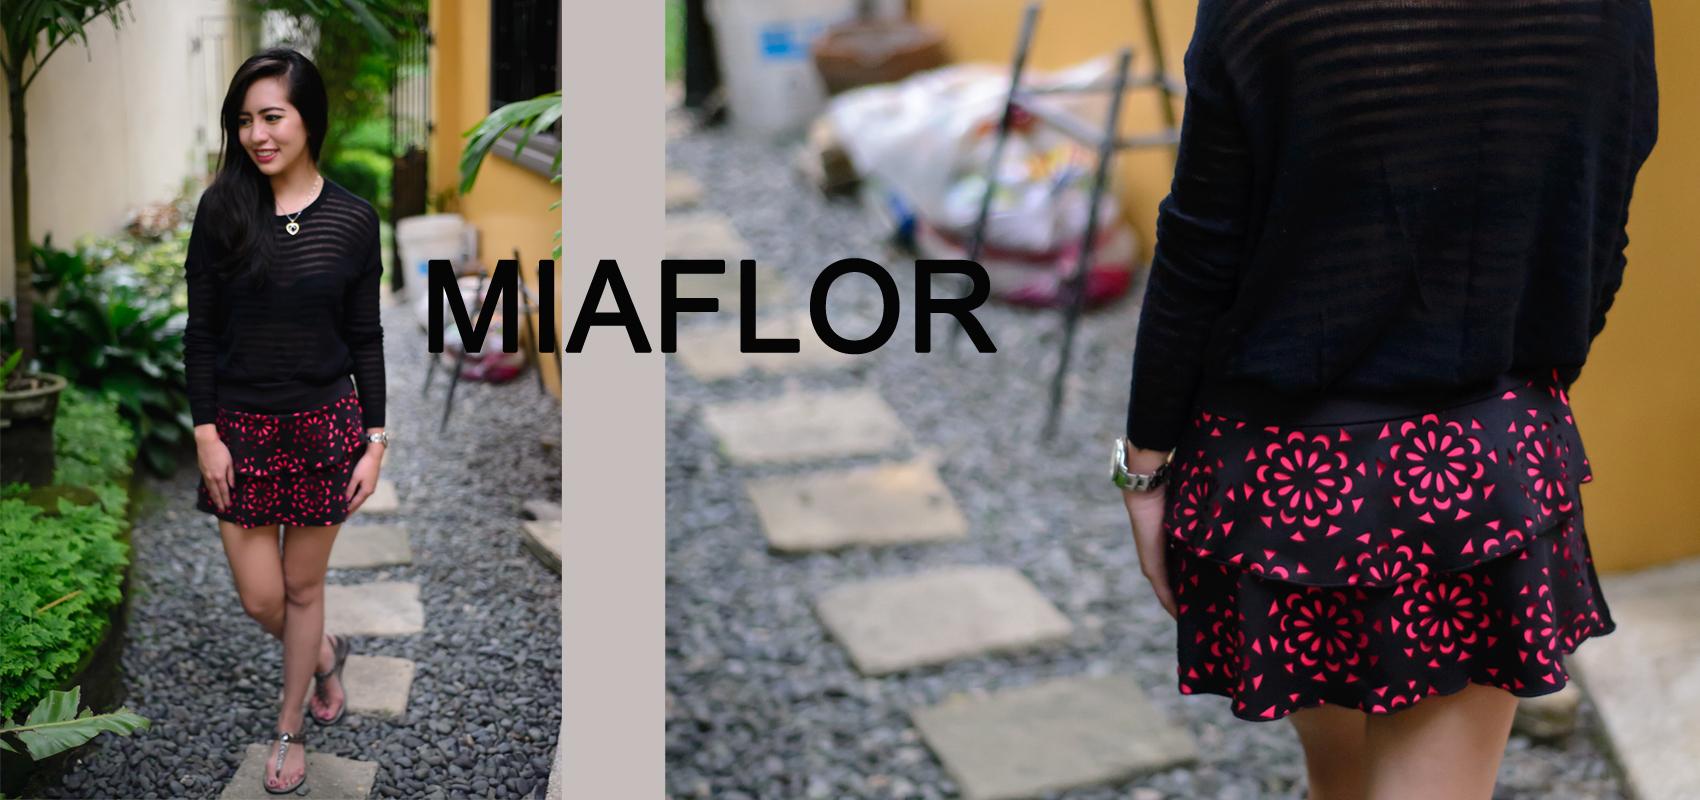 miaflor-banner-2.jpg